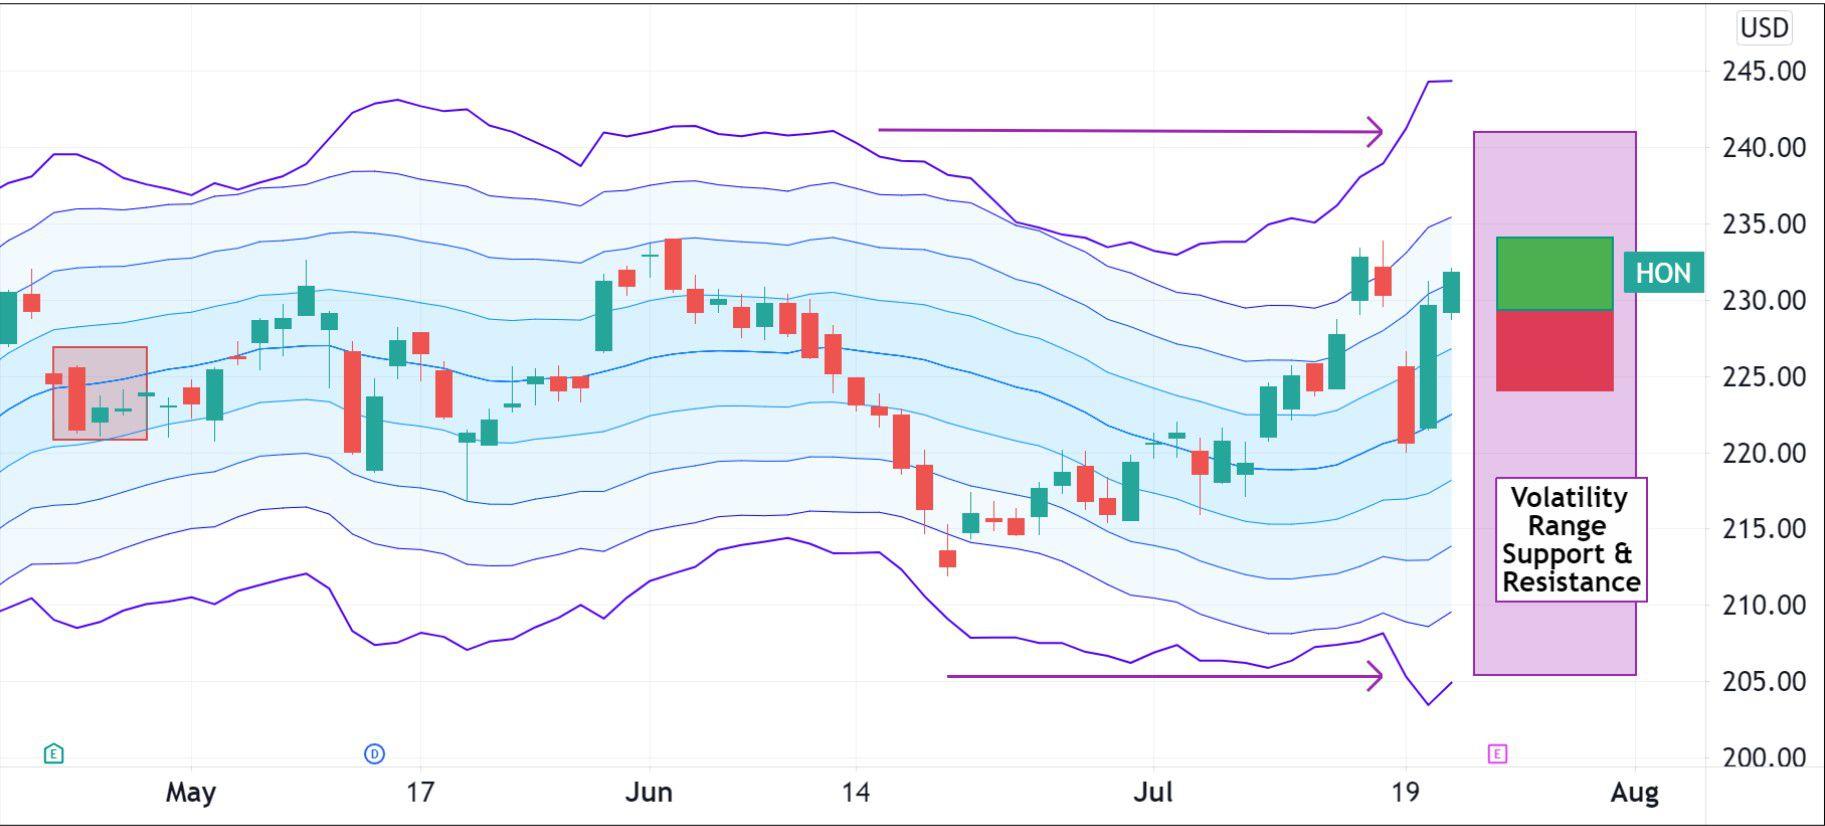 Volatility pattern for Honeywell International Inc. (HON)